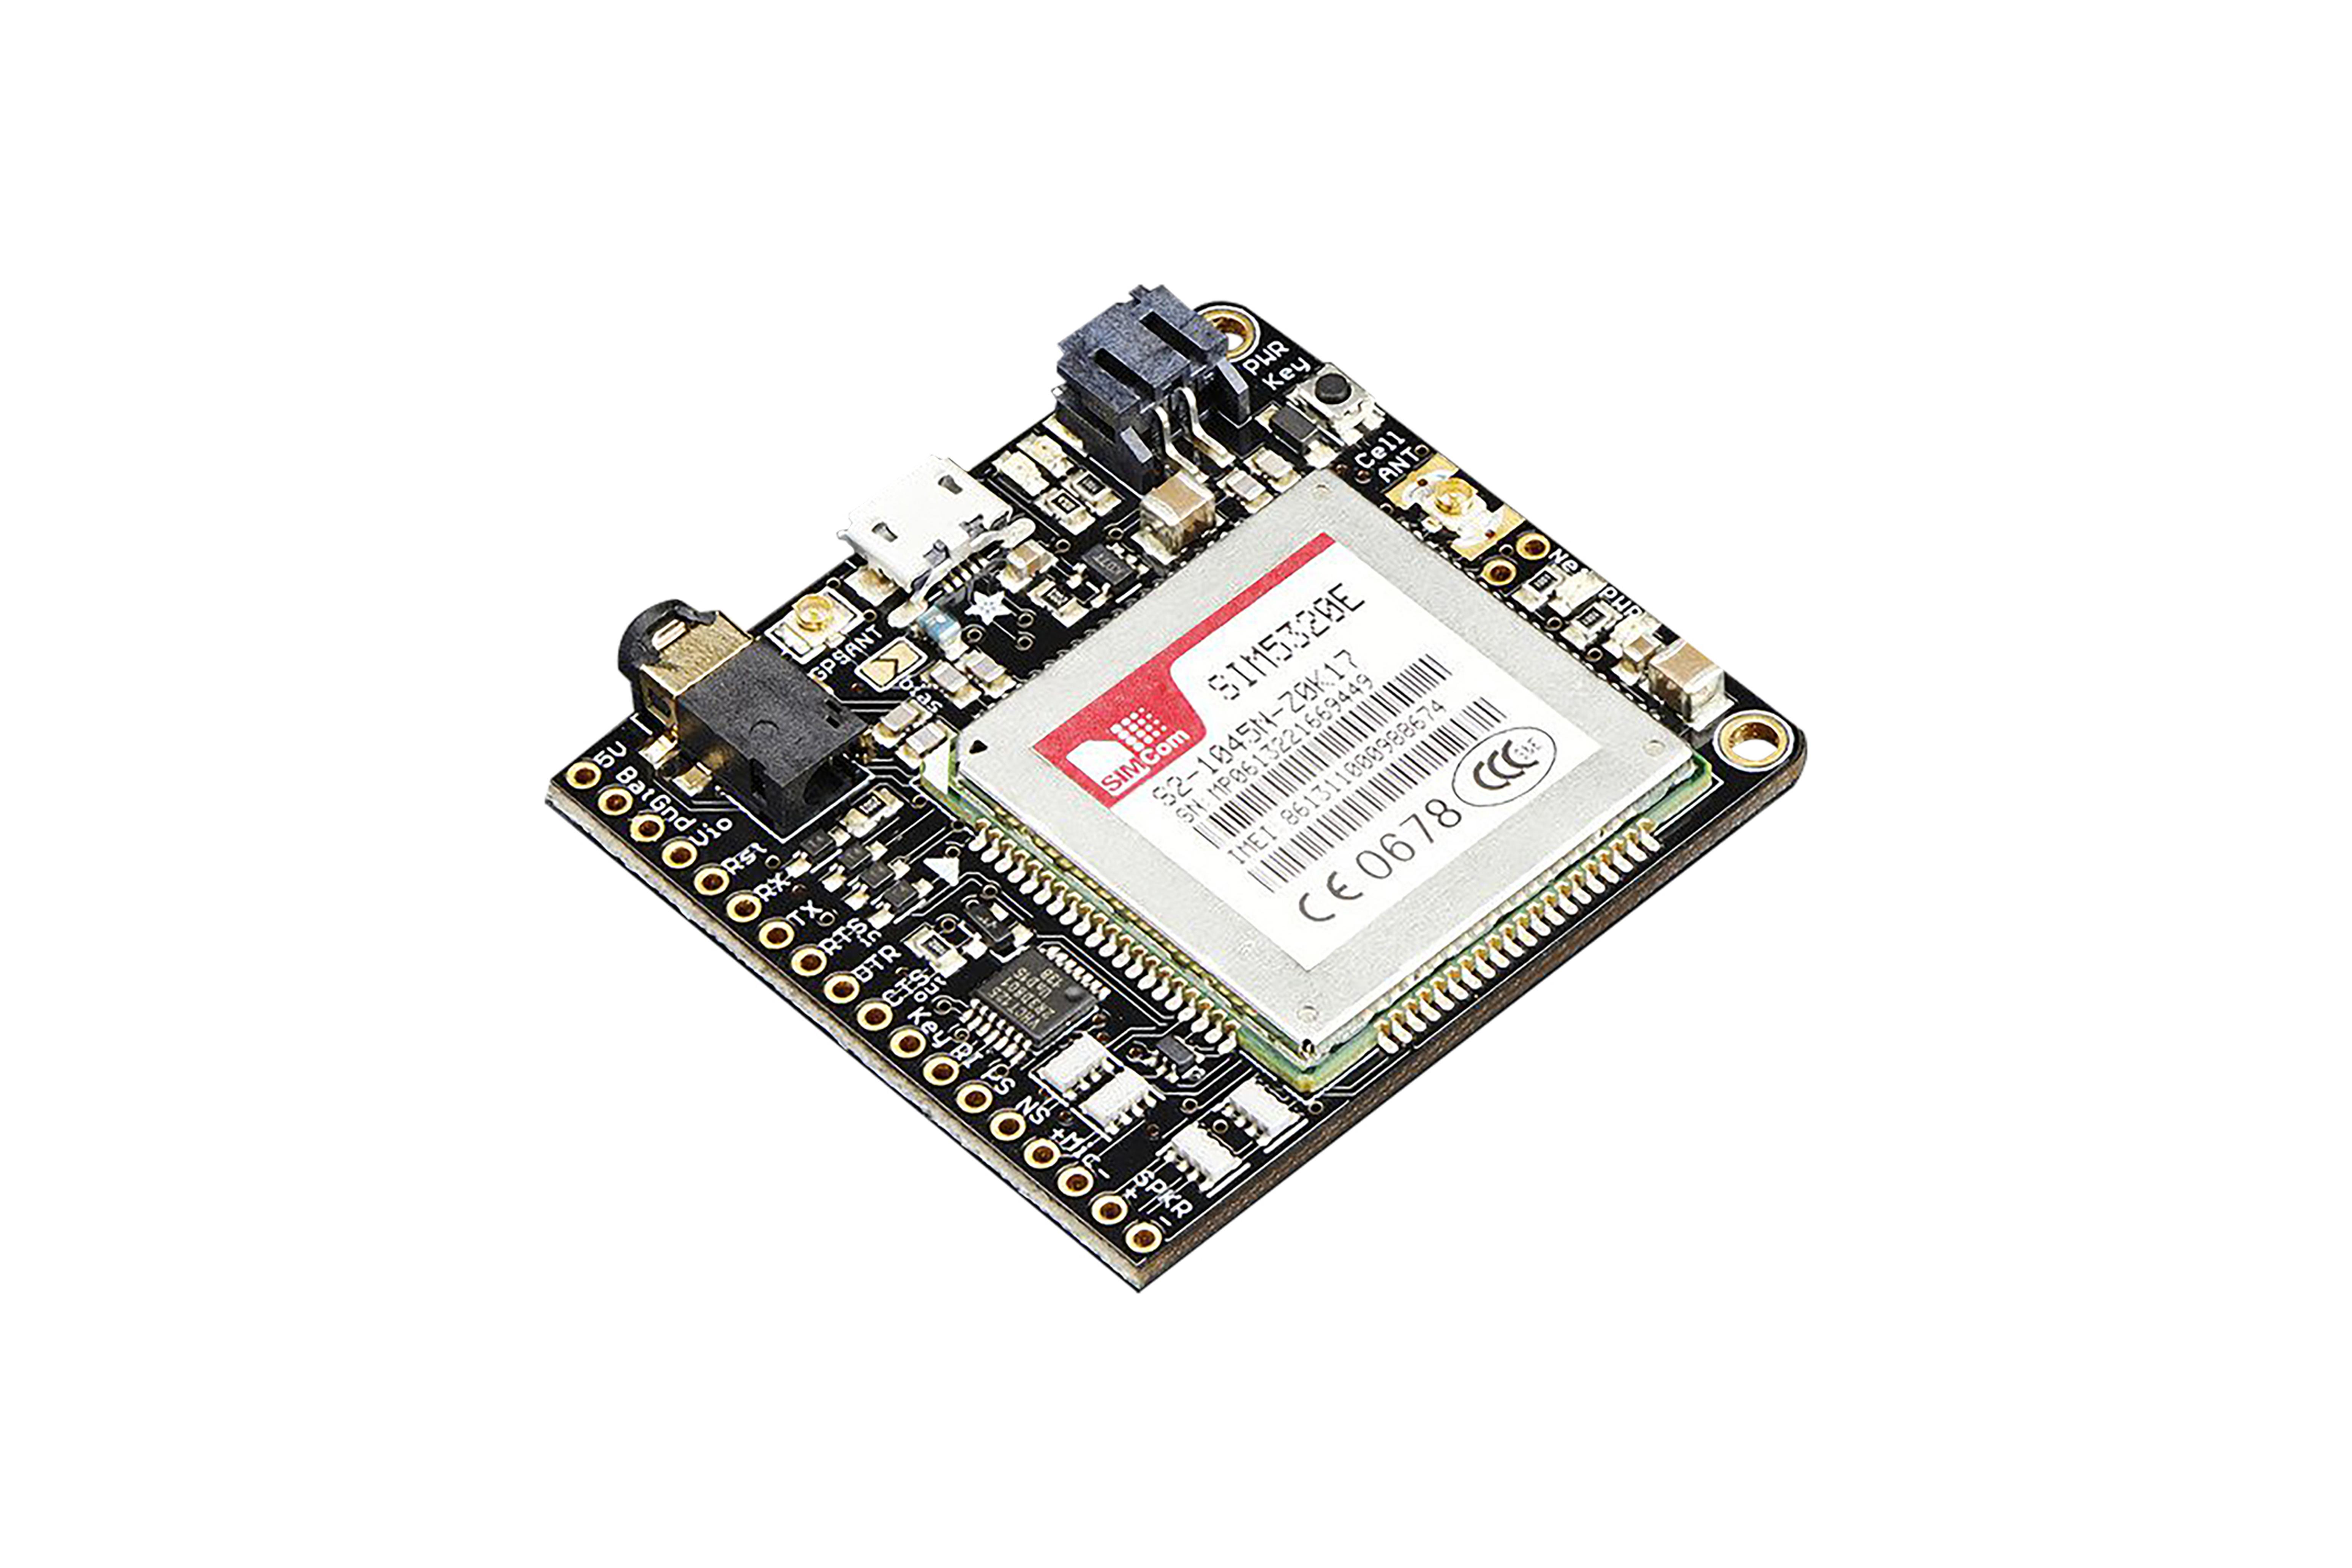 Adafruit Fona 3G Cellular Breakout Eu - 2691